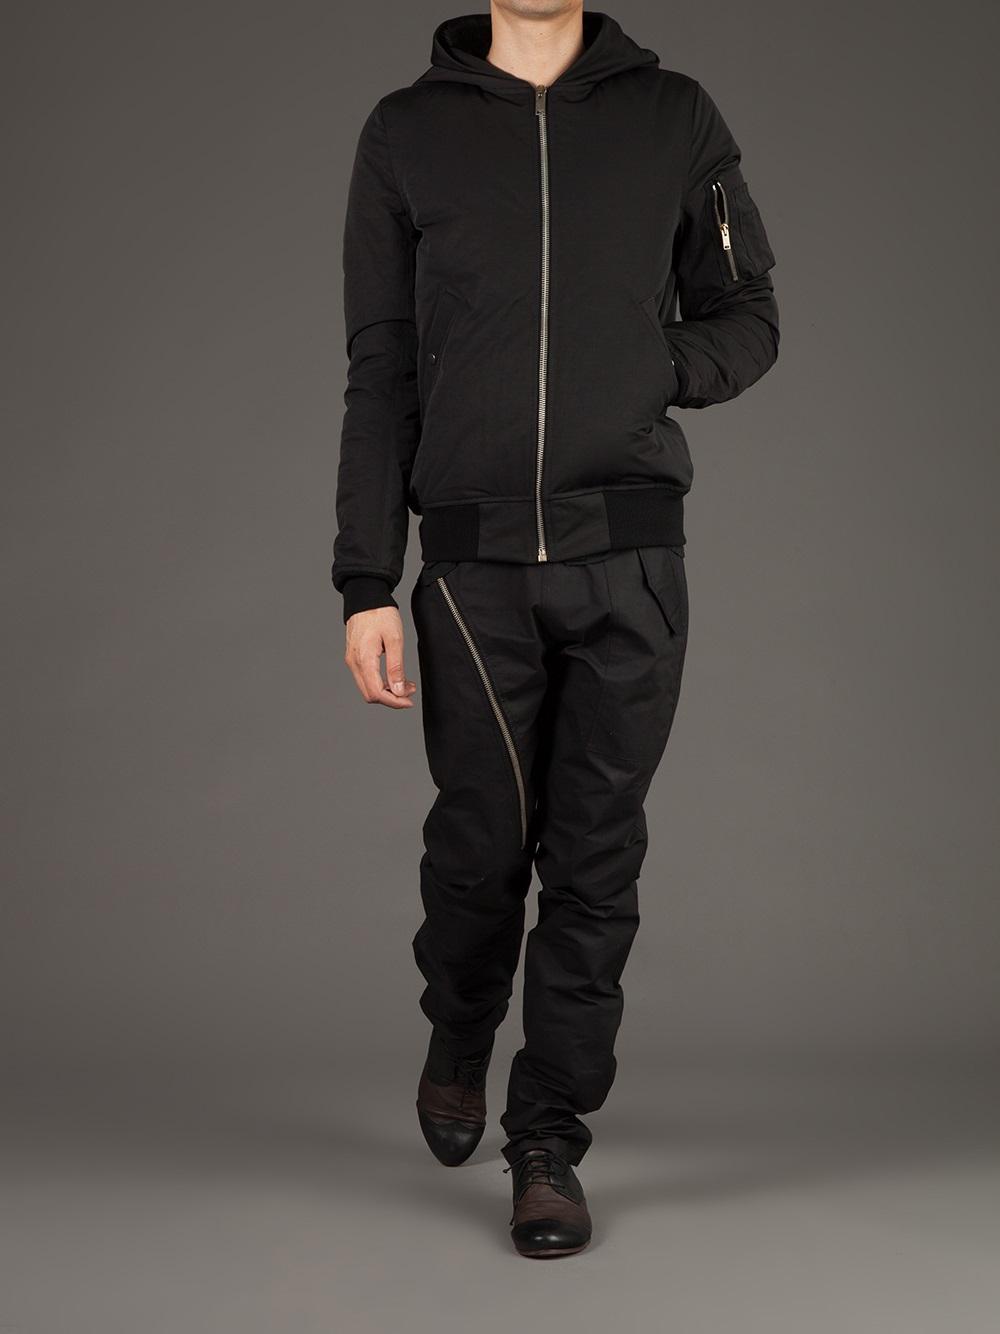 Lyst Rick Owens Hooded Bomber Jacket In Black For Men